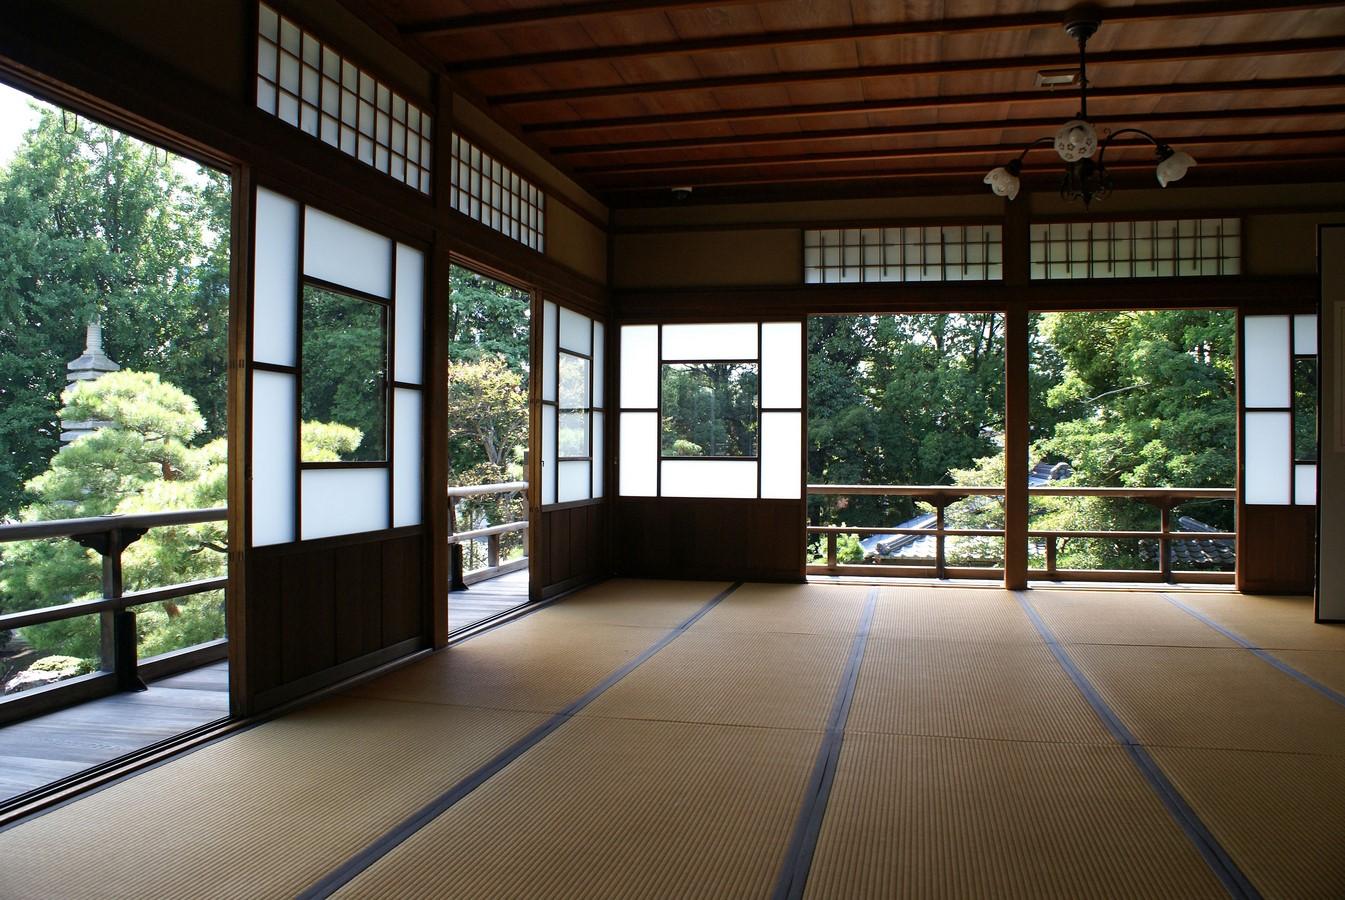 Nishiyama Onsen Keiunkan by Fujiwara Mahito: World's oldest Hotel - Sheet3